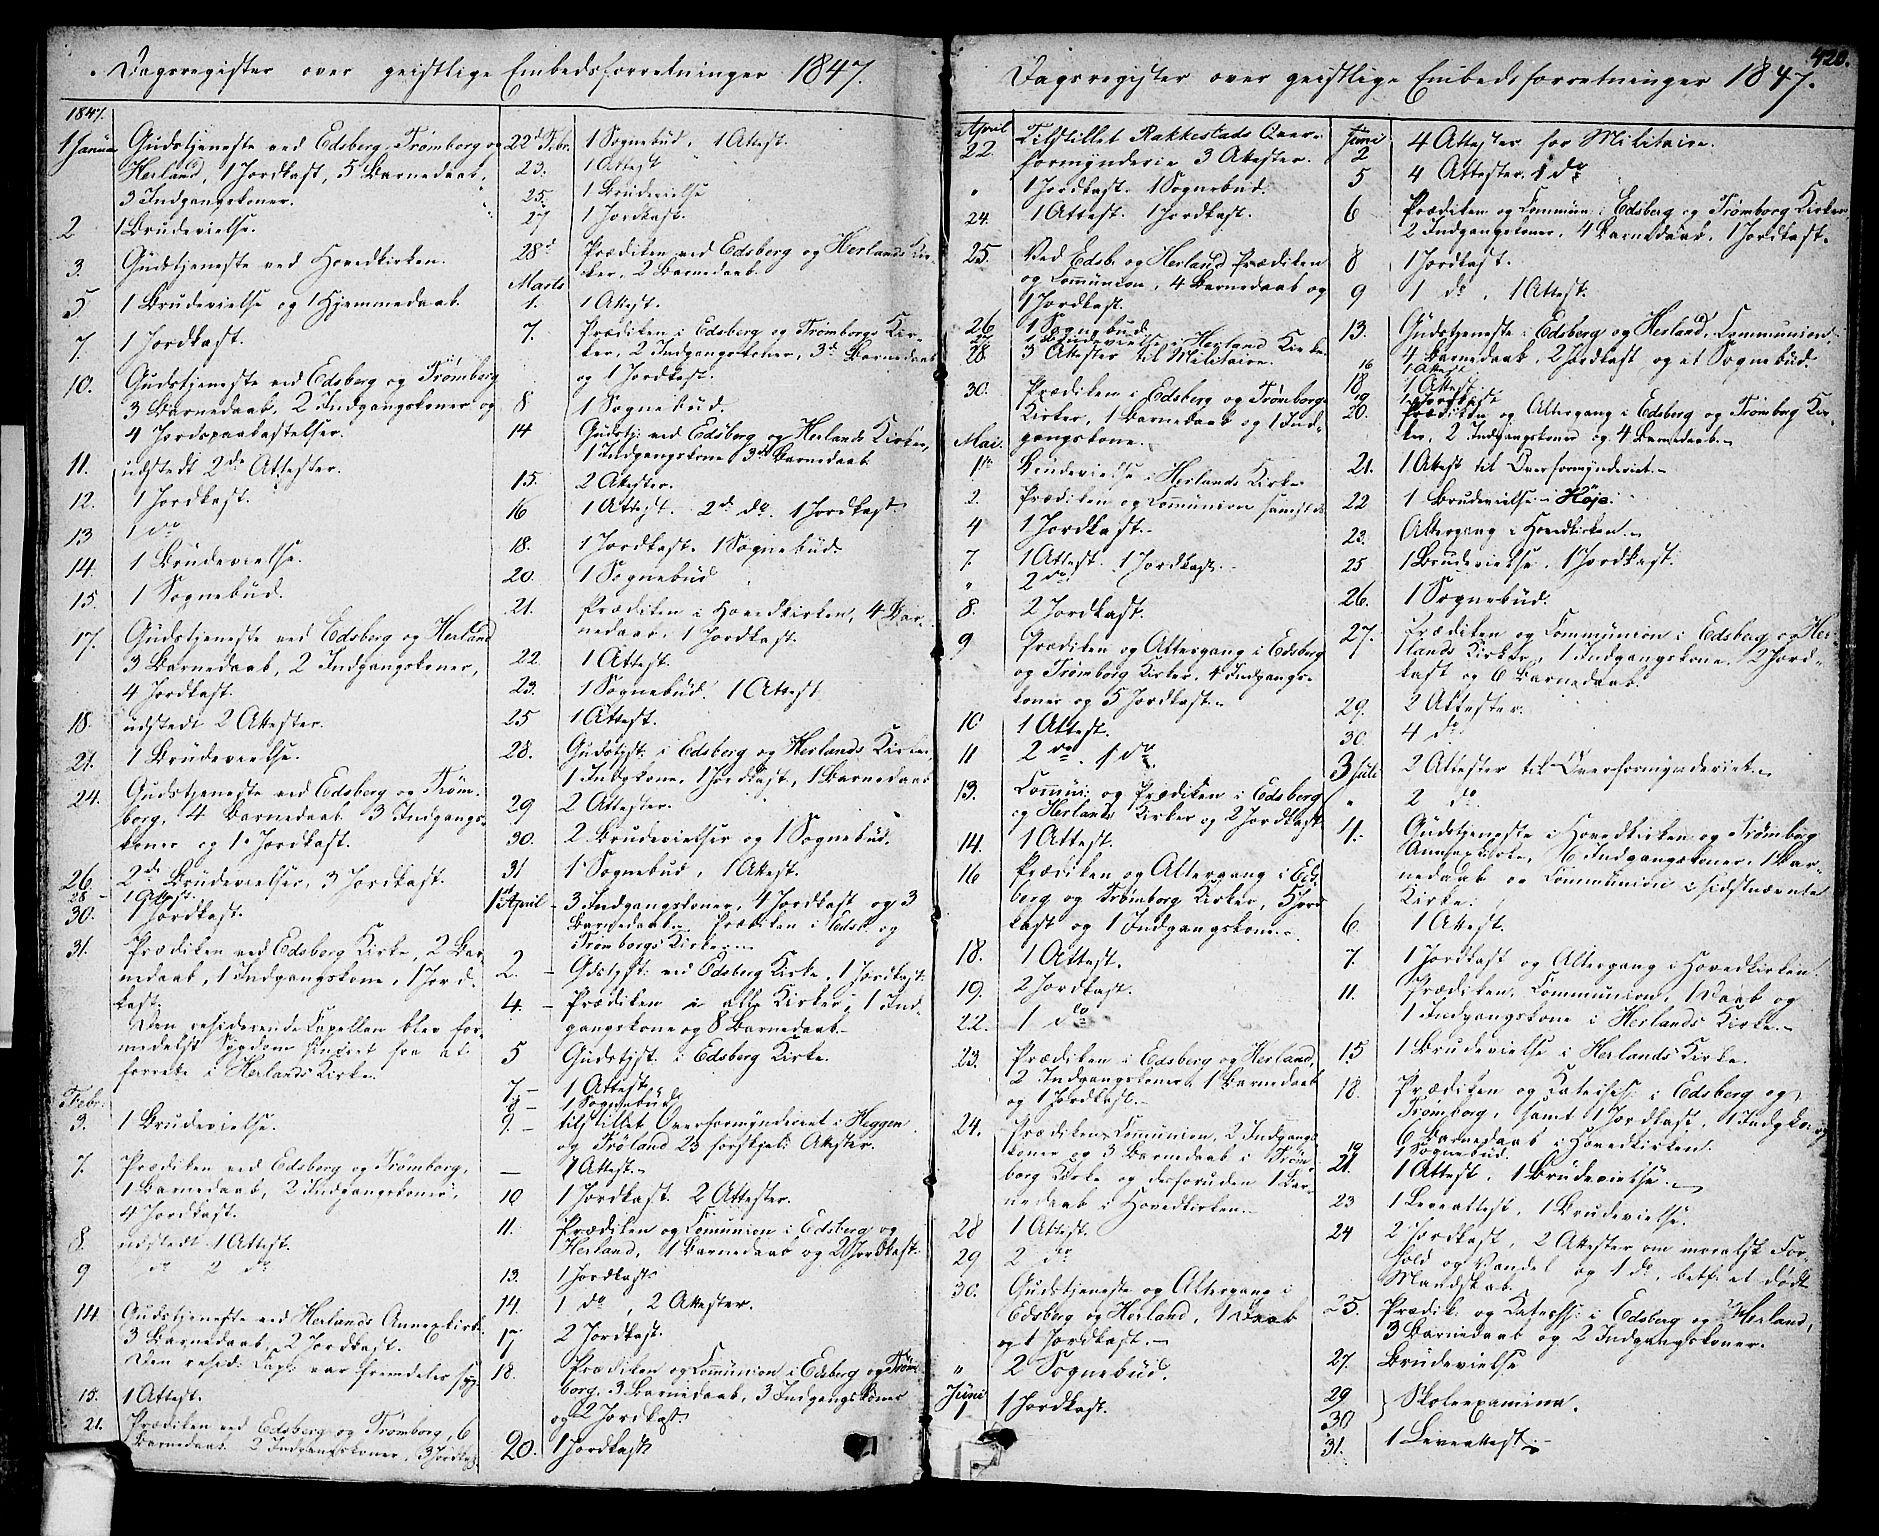 SAO, Eidsberg prestekontor Kirkebøker, F/Fa/L0008: Ministerialbok nr. I 8, 1832-1848, s. 420